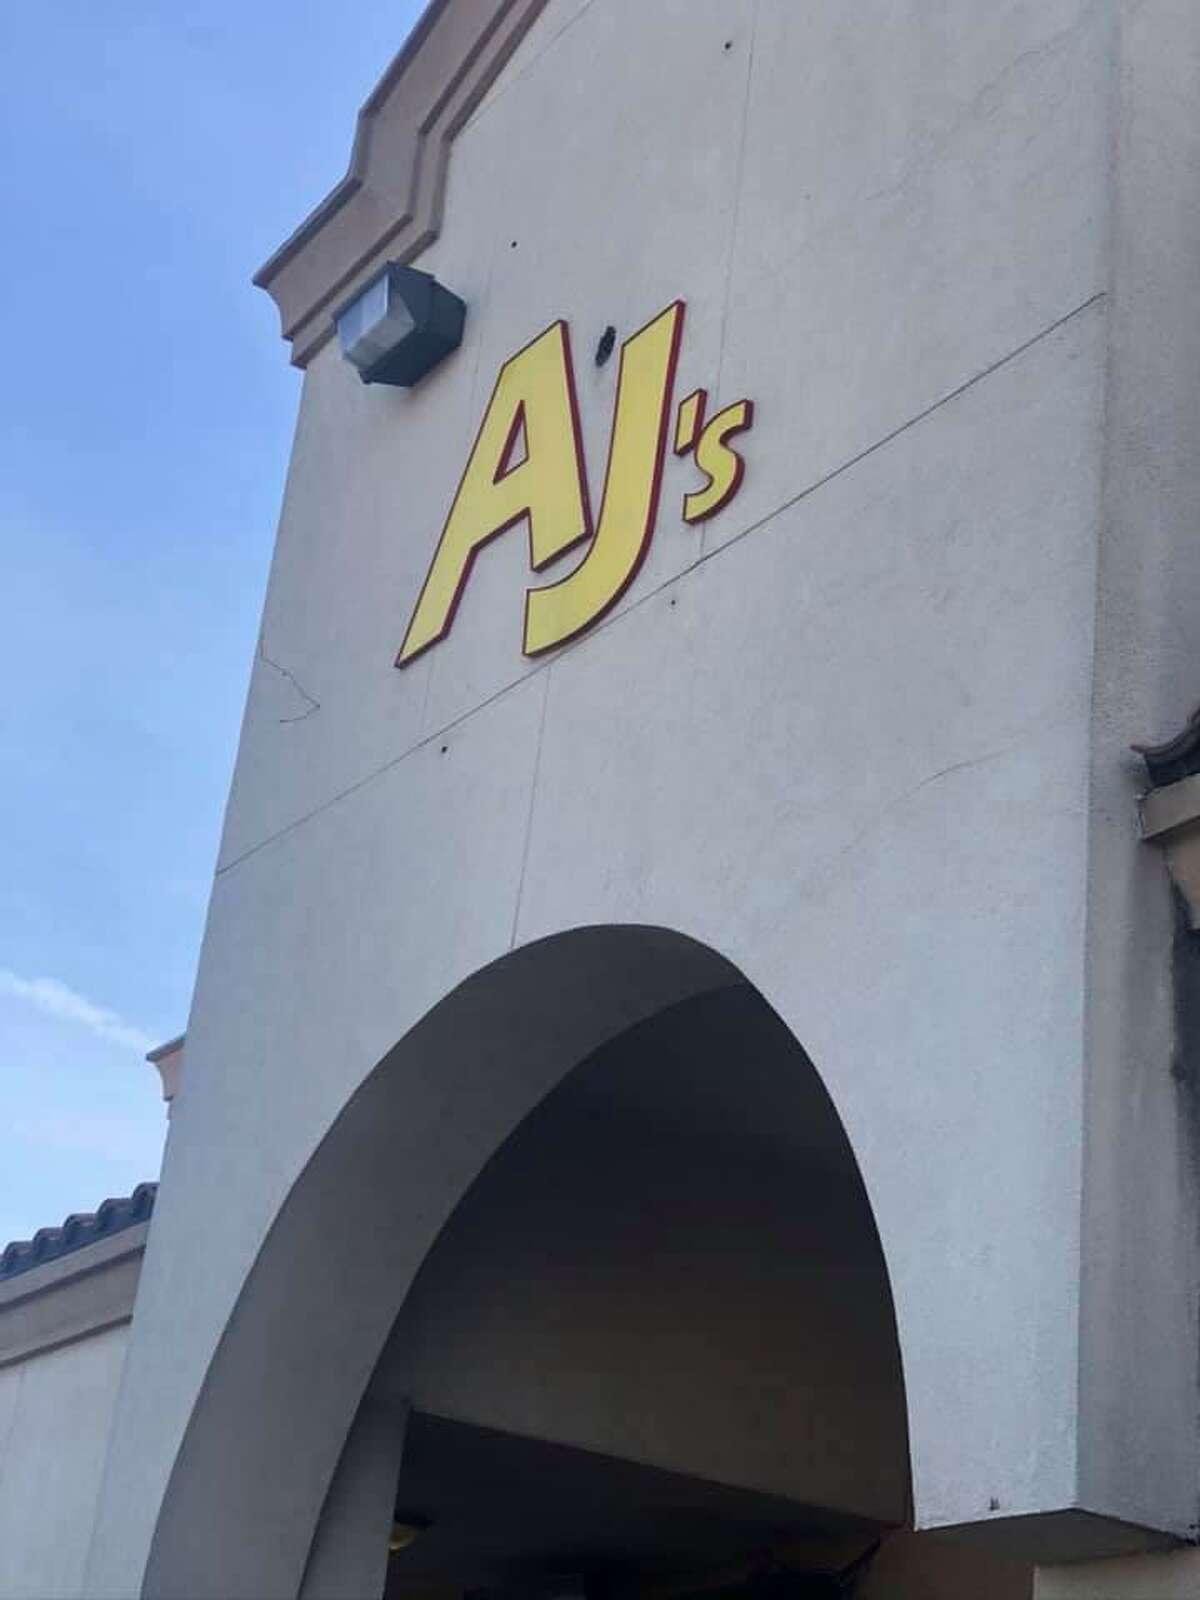 Gutierrez is planning on reopening AJ's Bar.